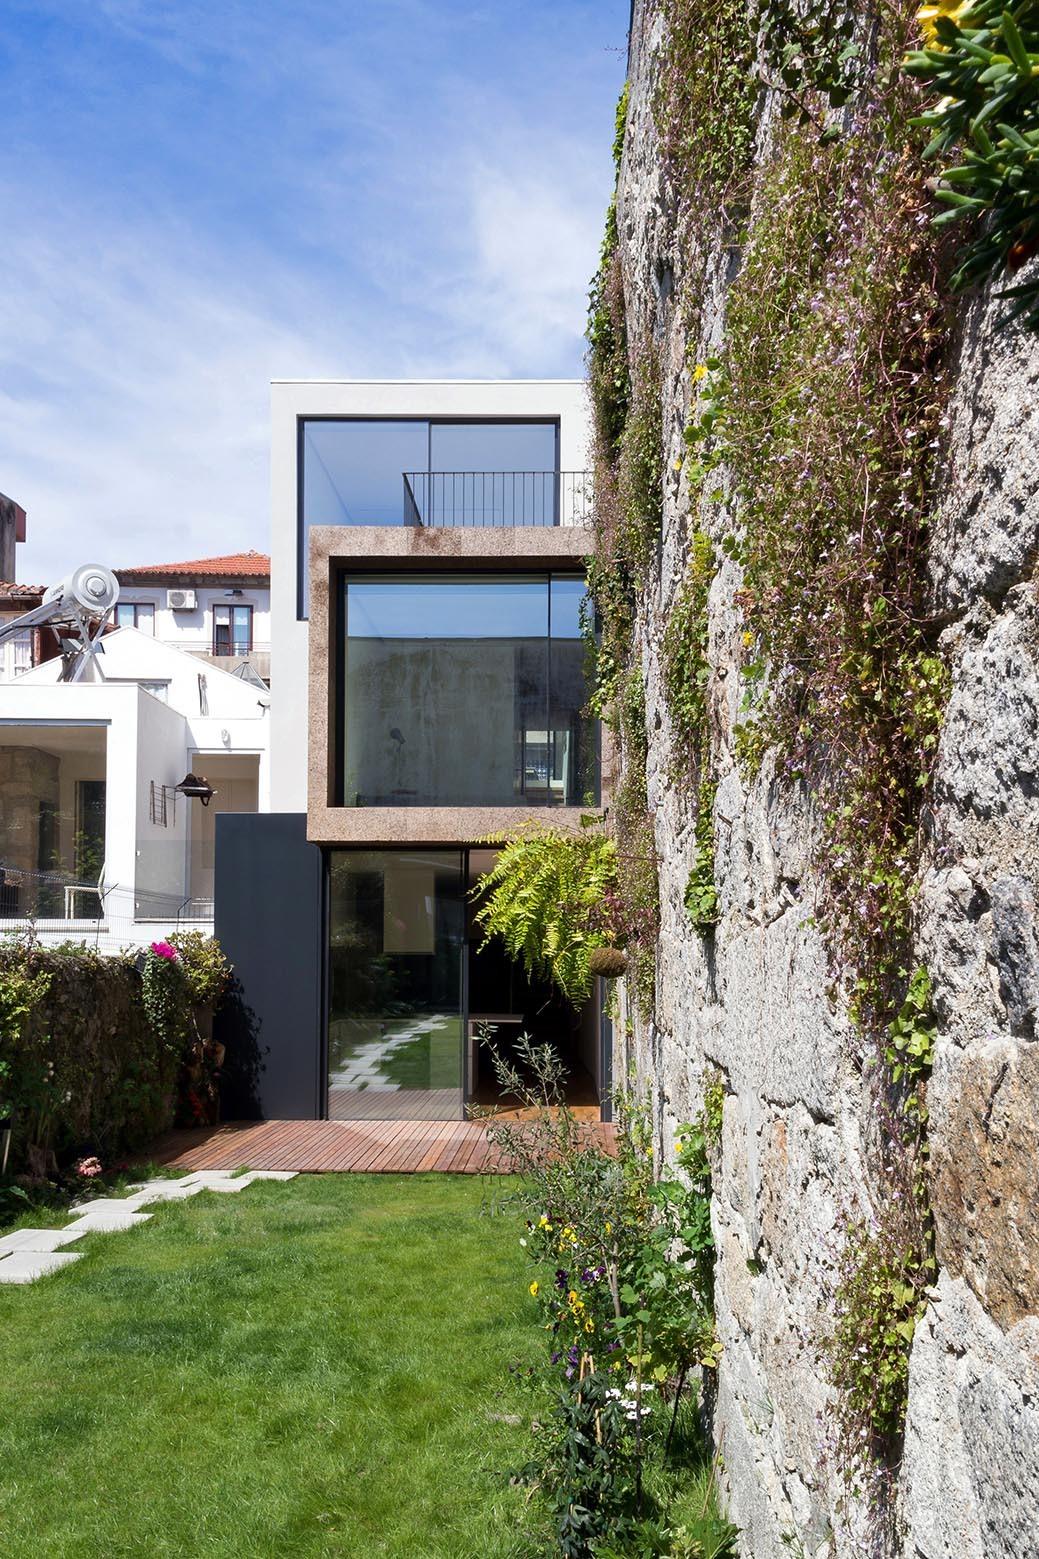 Casa Bonjardim / ATKA arquitectos